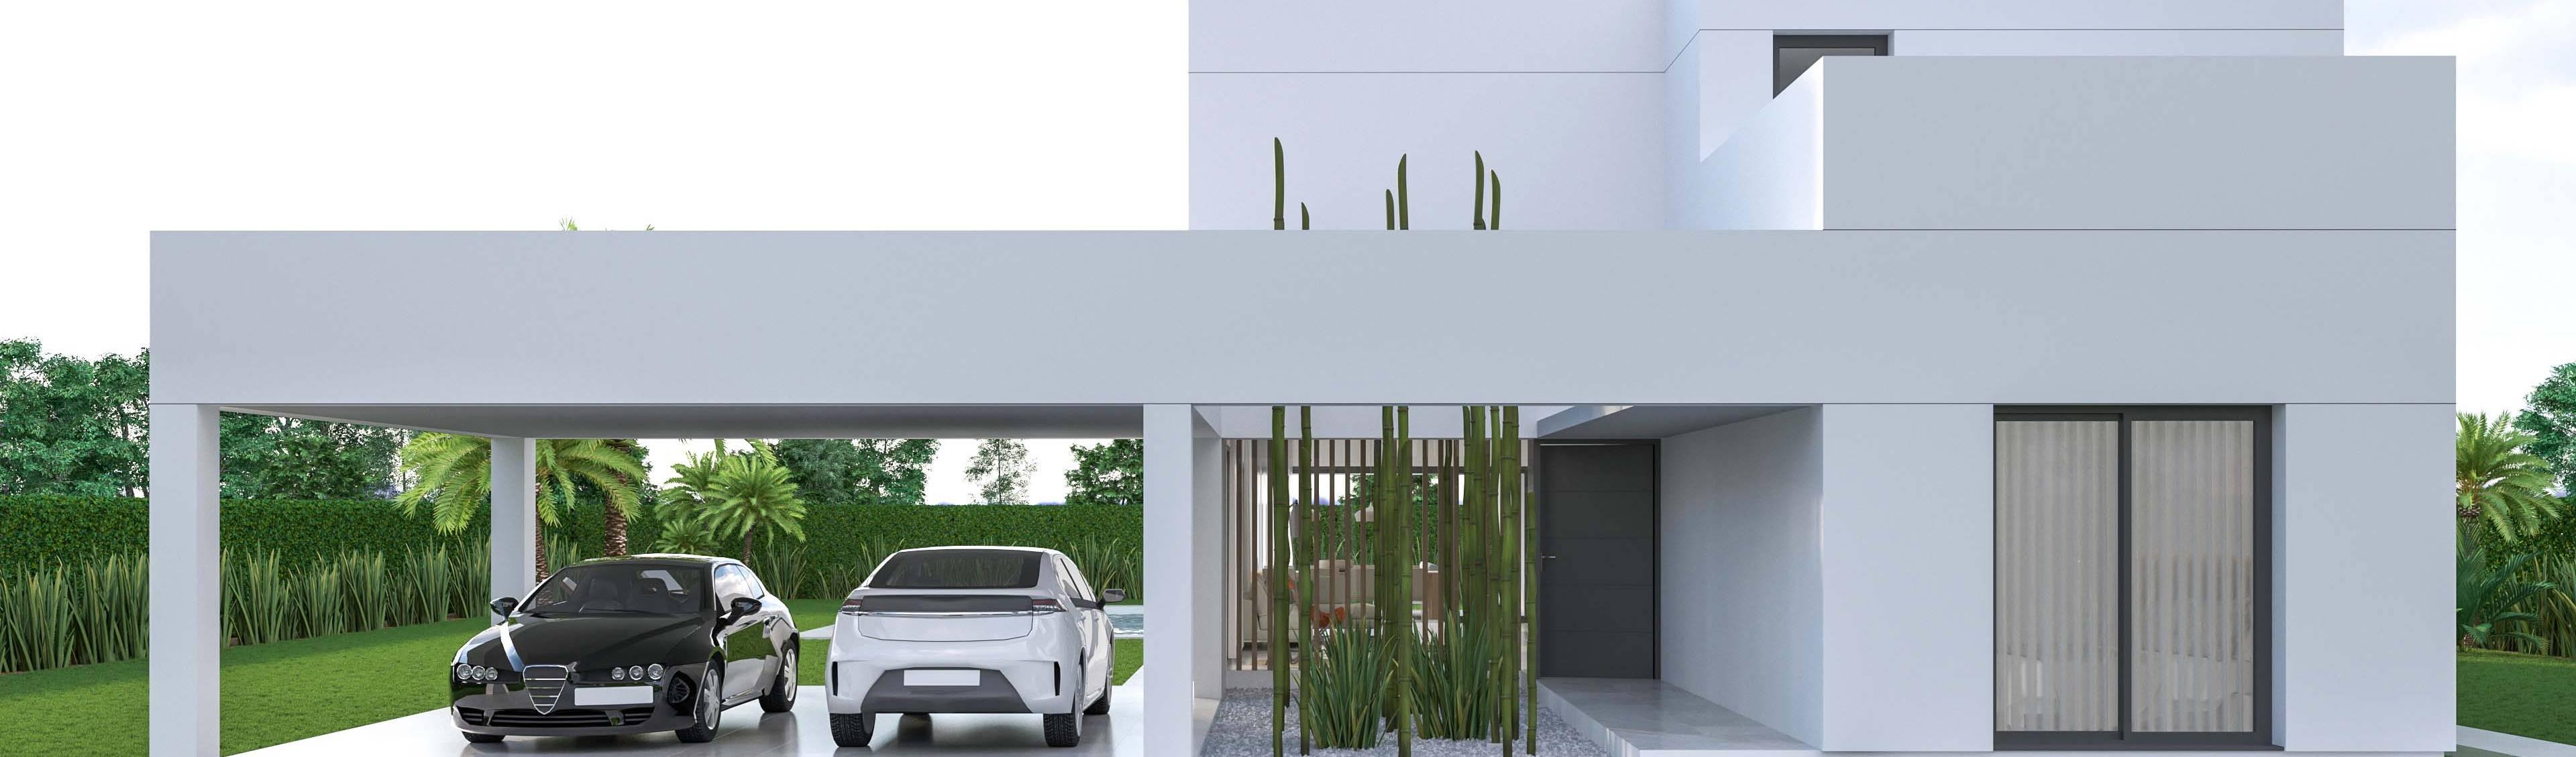 Proyecto 3D Valencia Renders Animaciones 3D Infografias Online